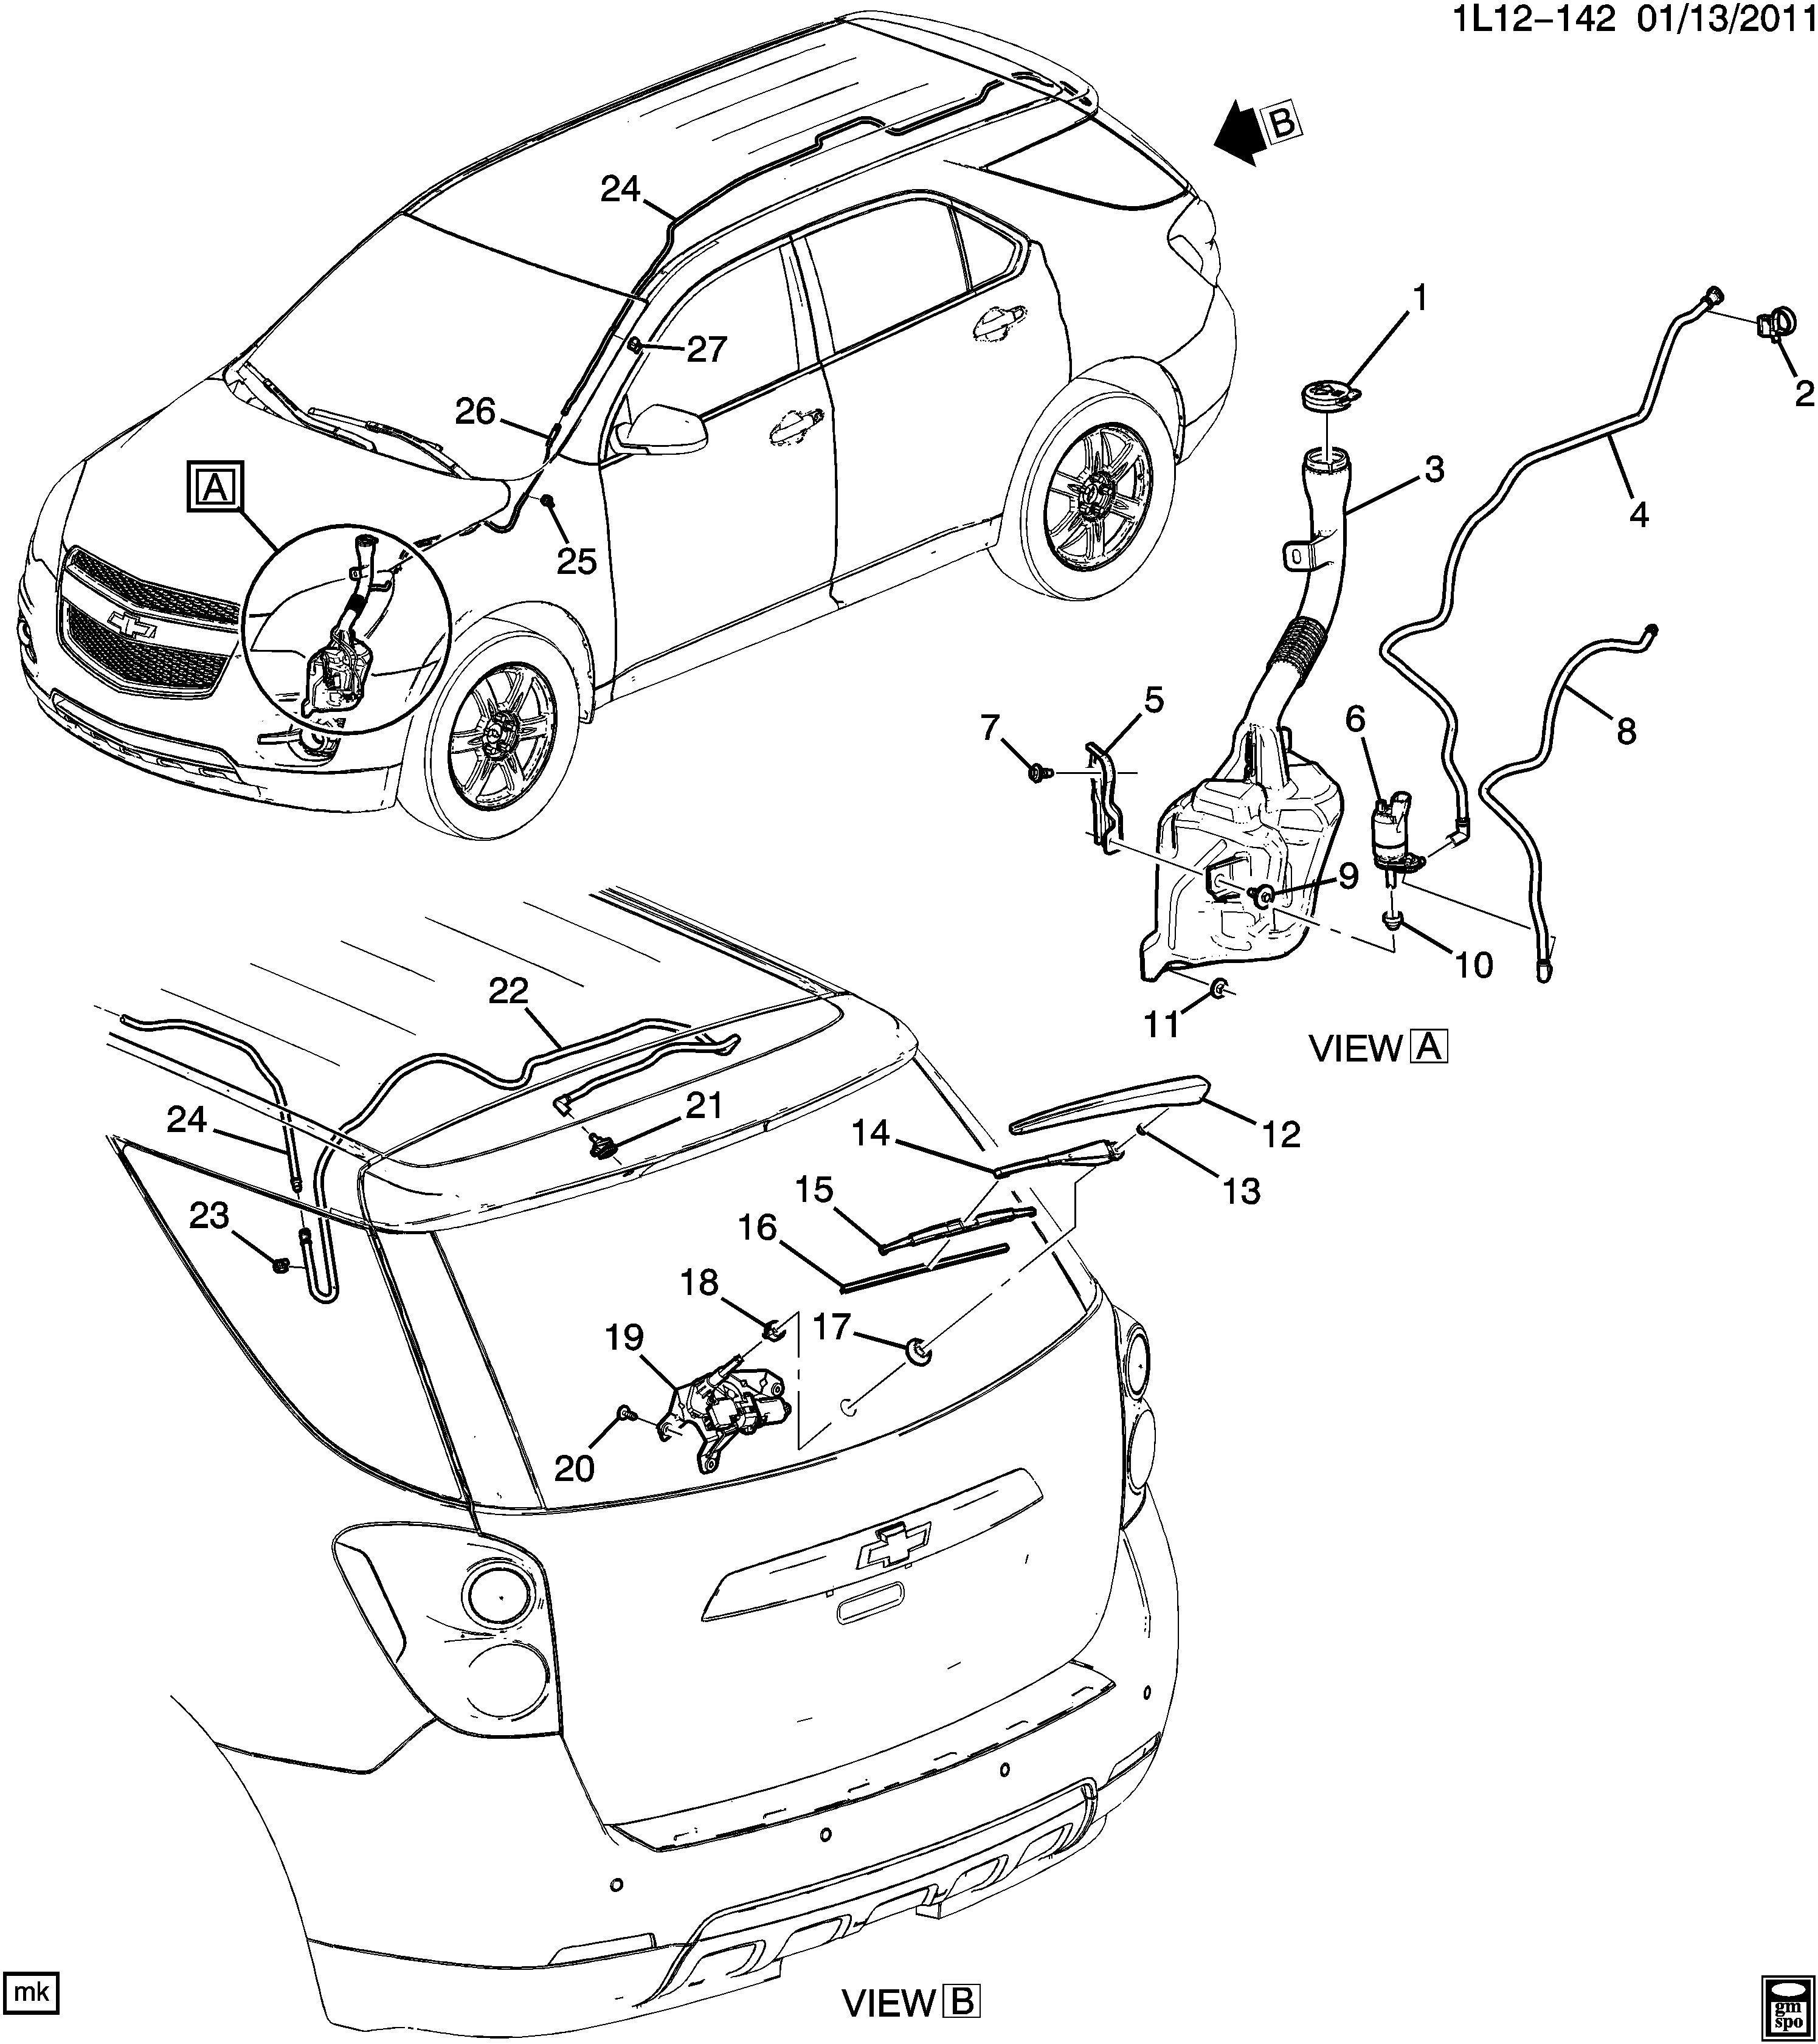 Chevrolet Equinox Motor Rear Window Wiper Motor R Wdo